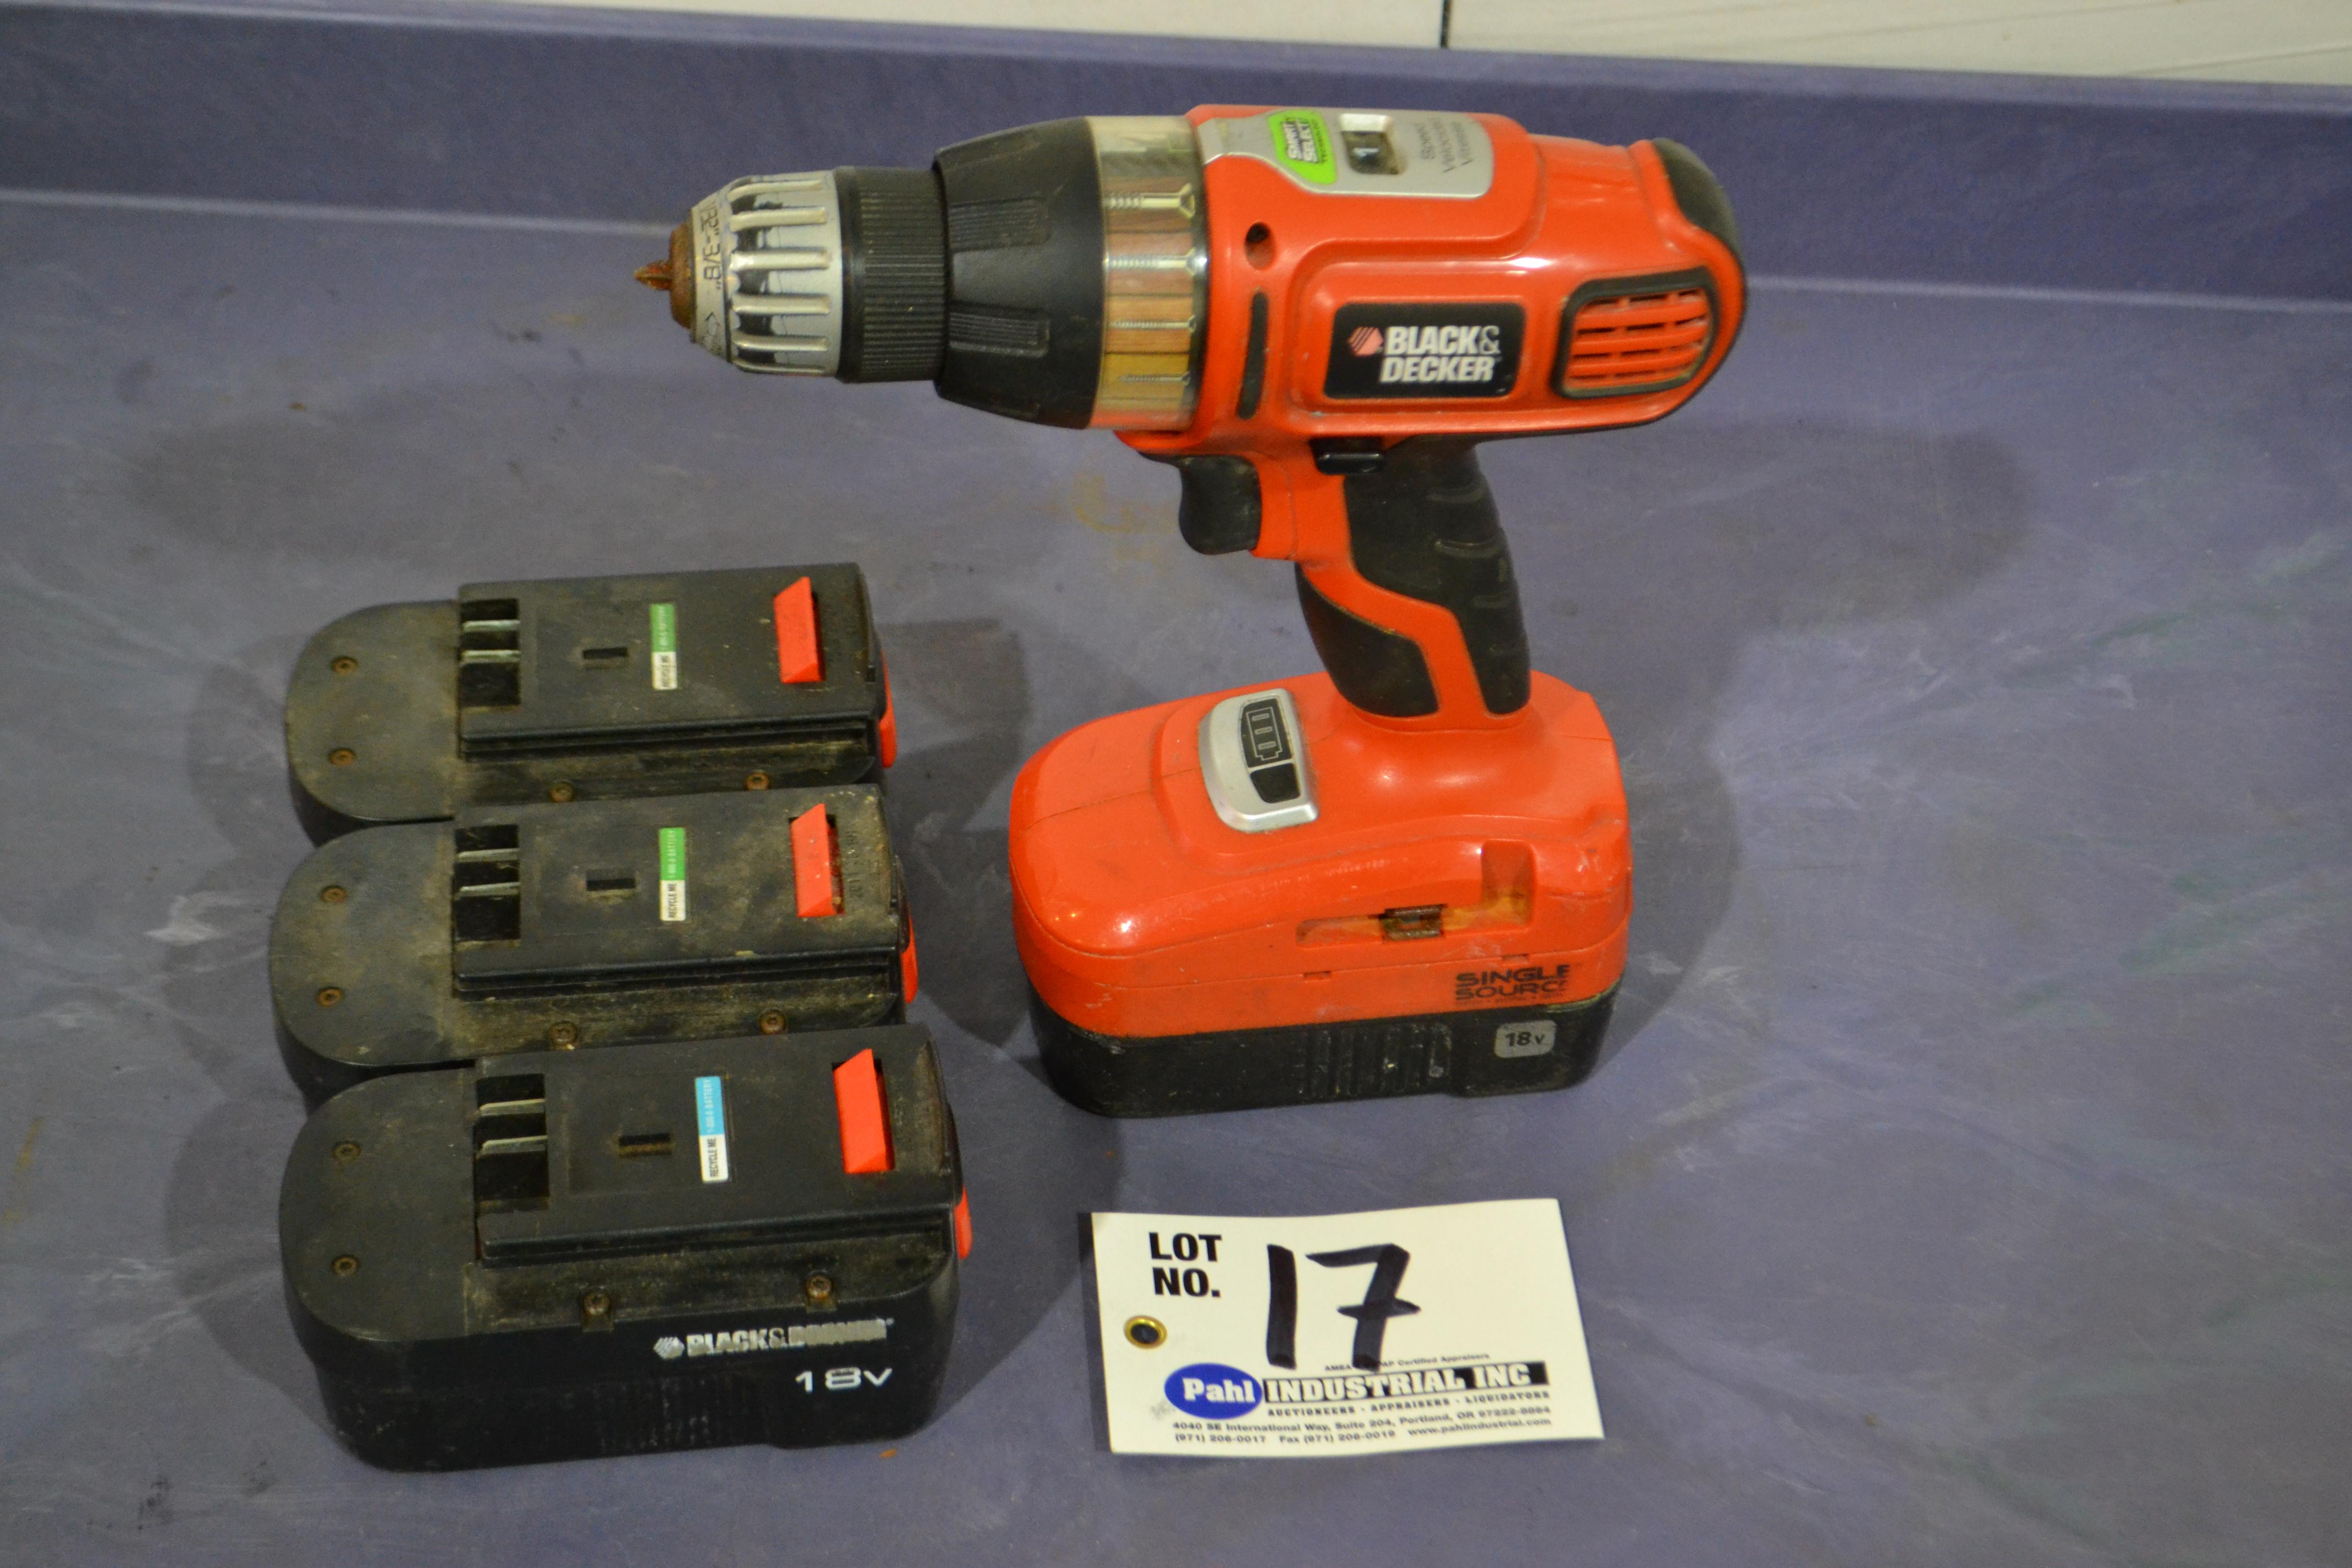 Lot 17 - Black & Decker 18V Cordless Drill c/w 4 Batteries no charger